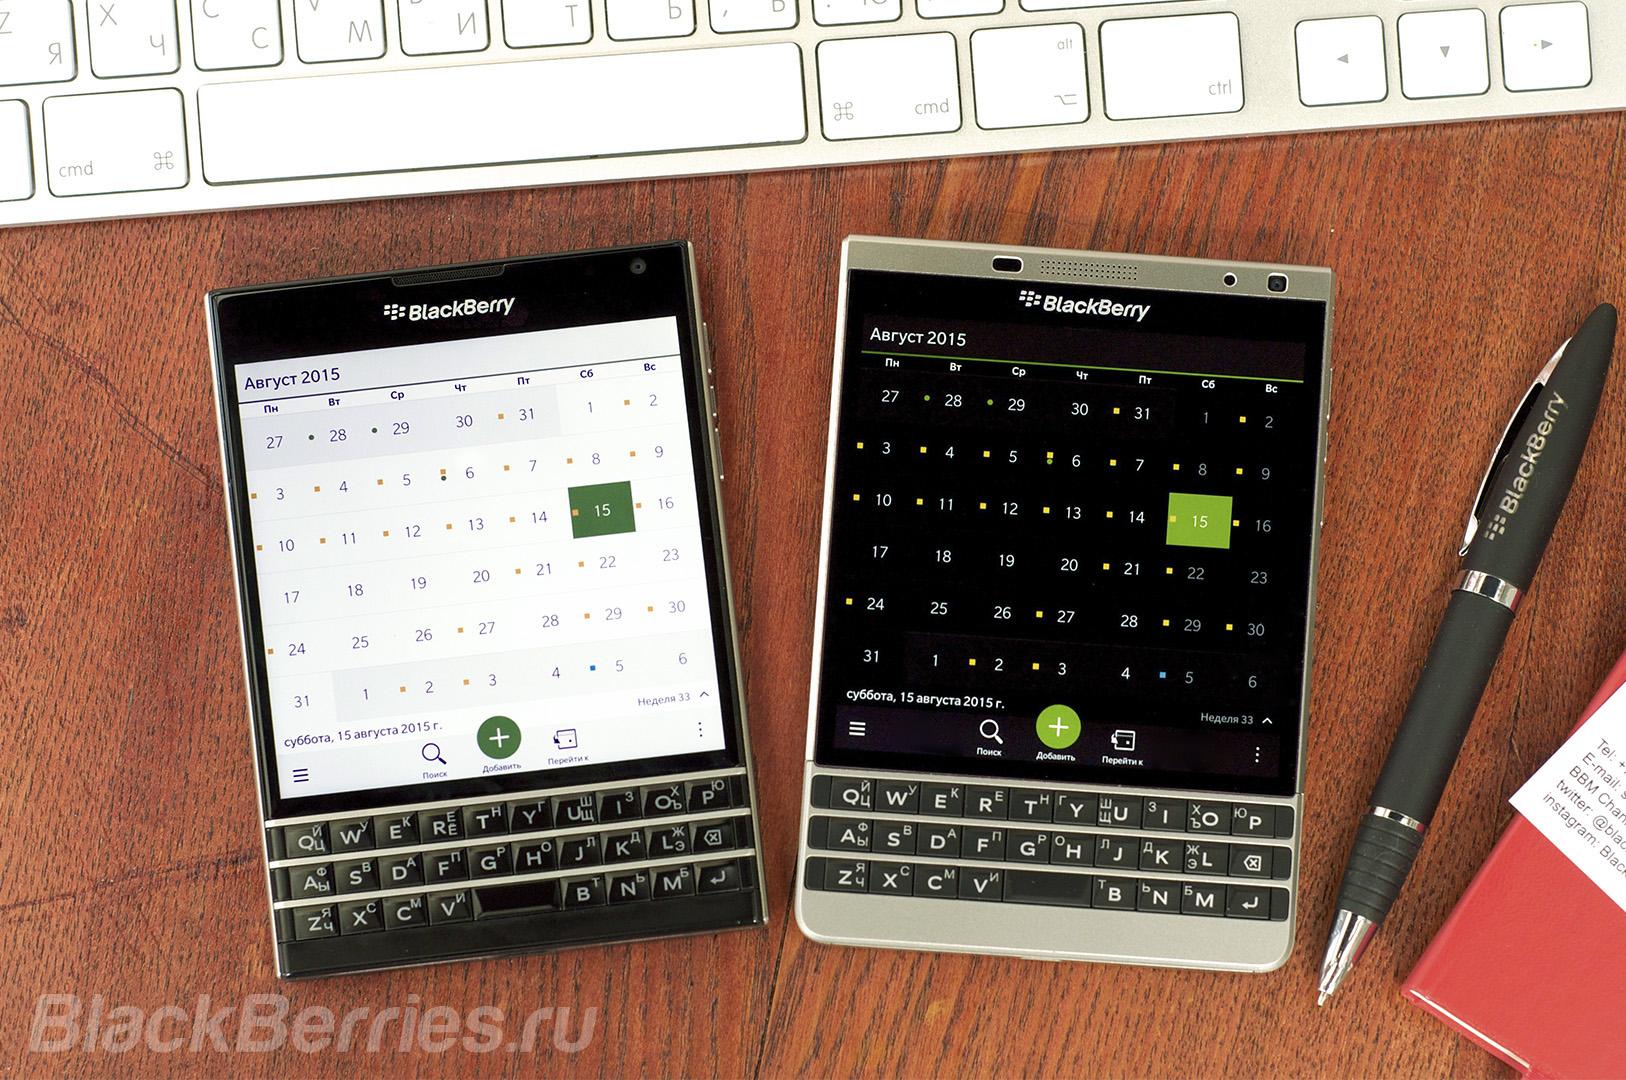 BlackBerry-Passport-Silver-Edition-2016